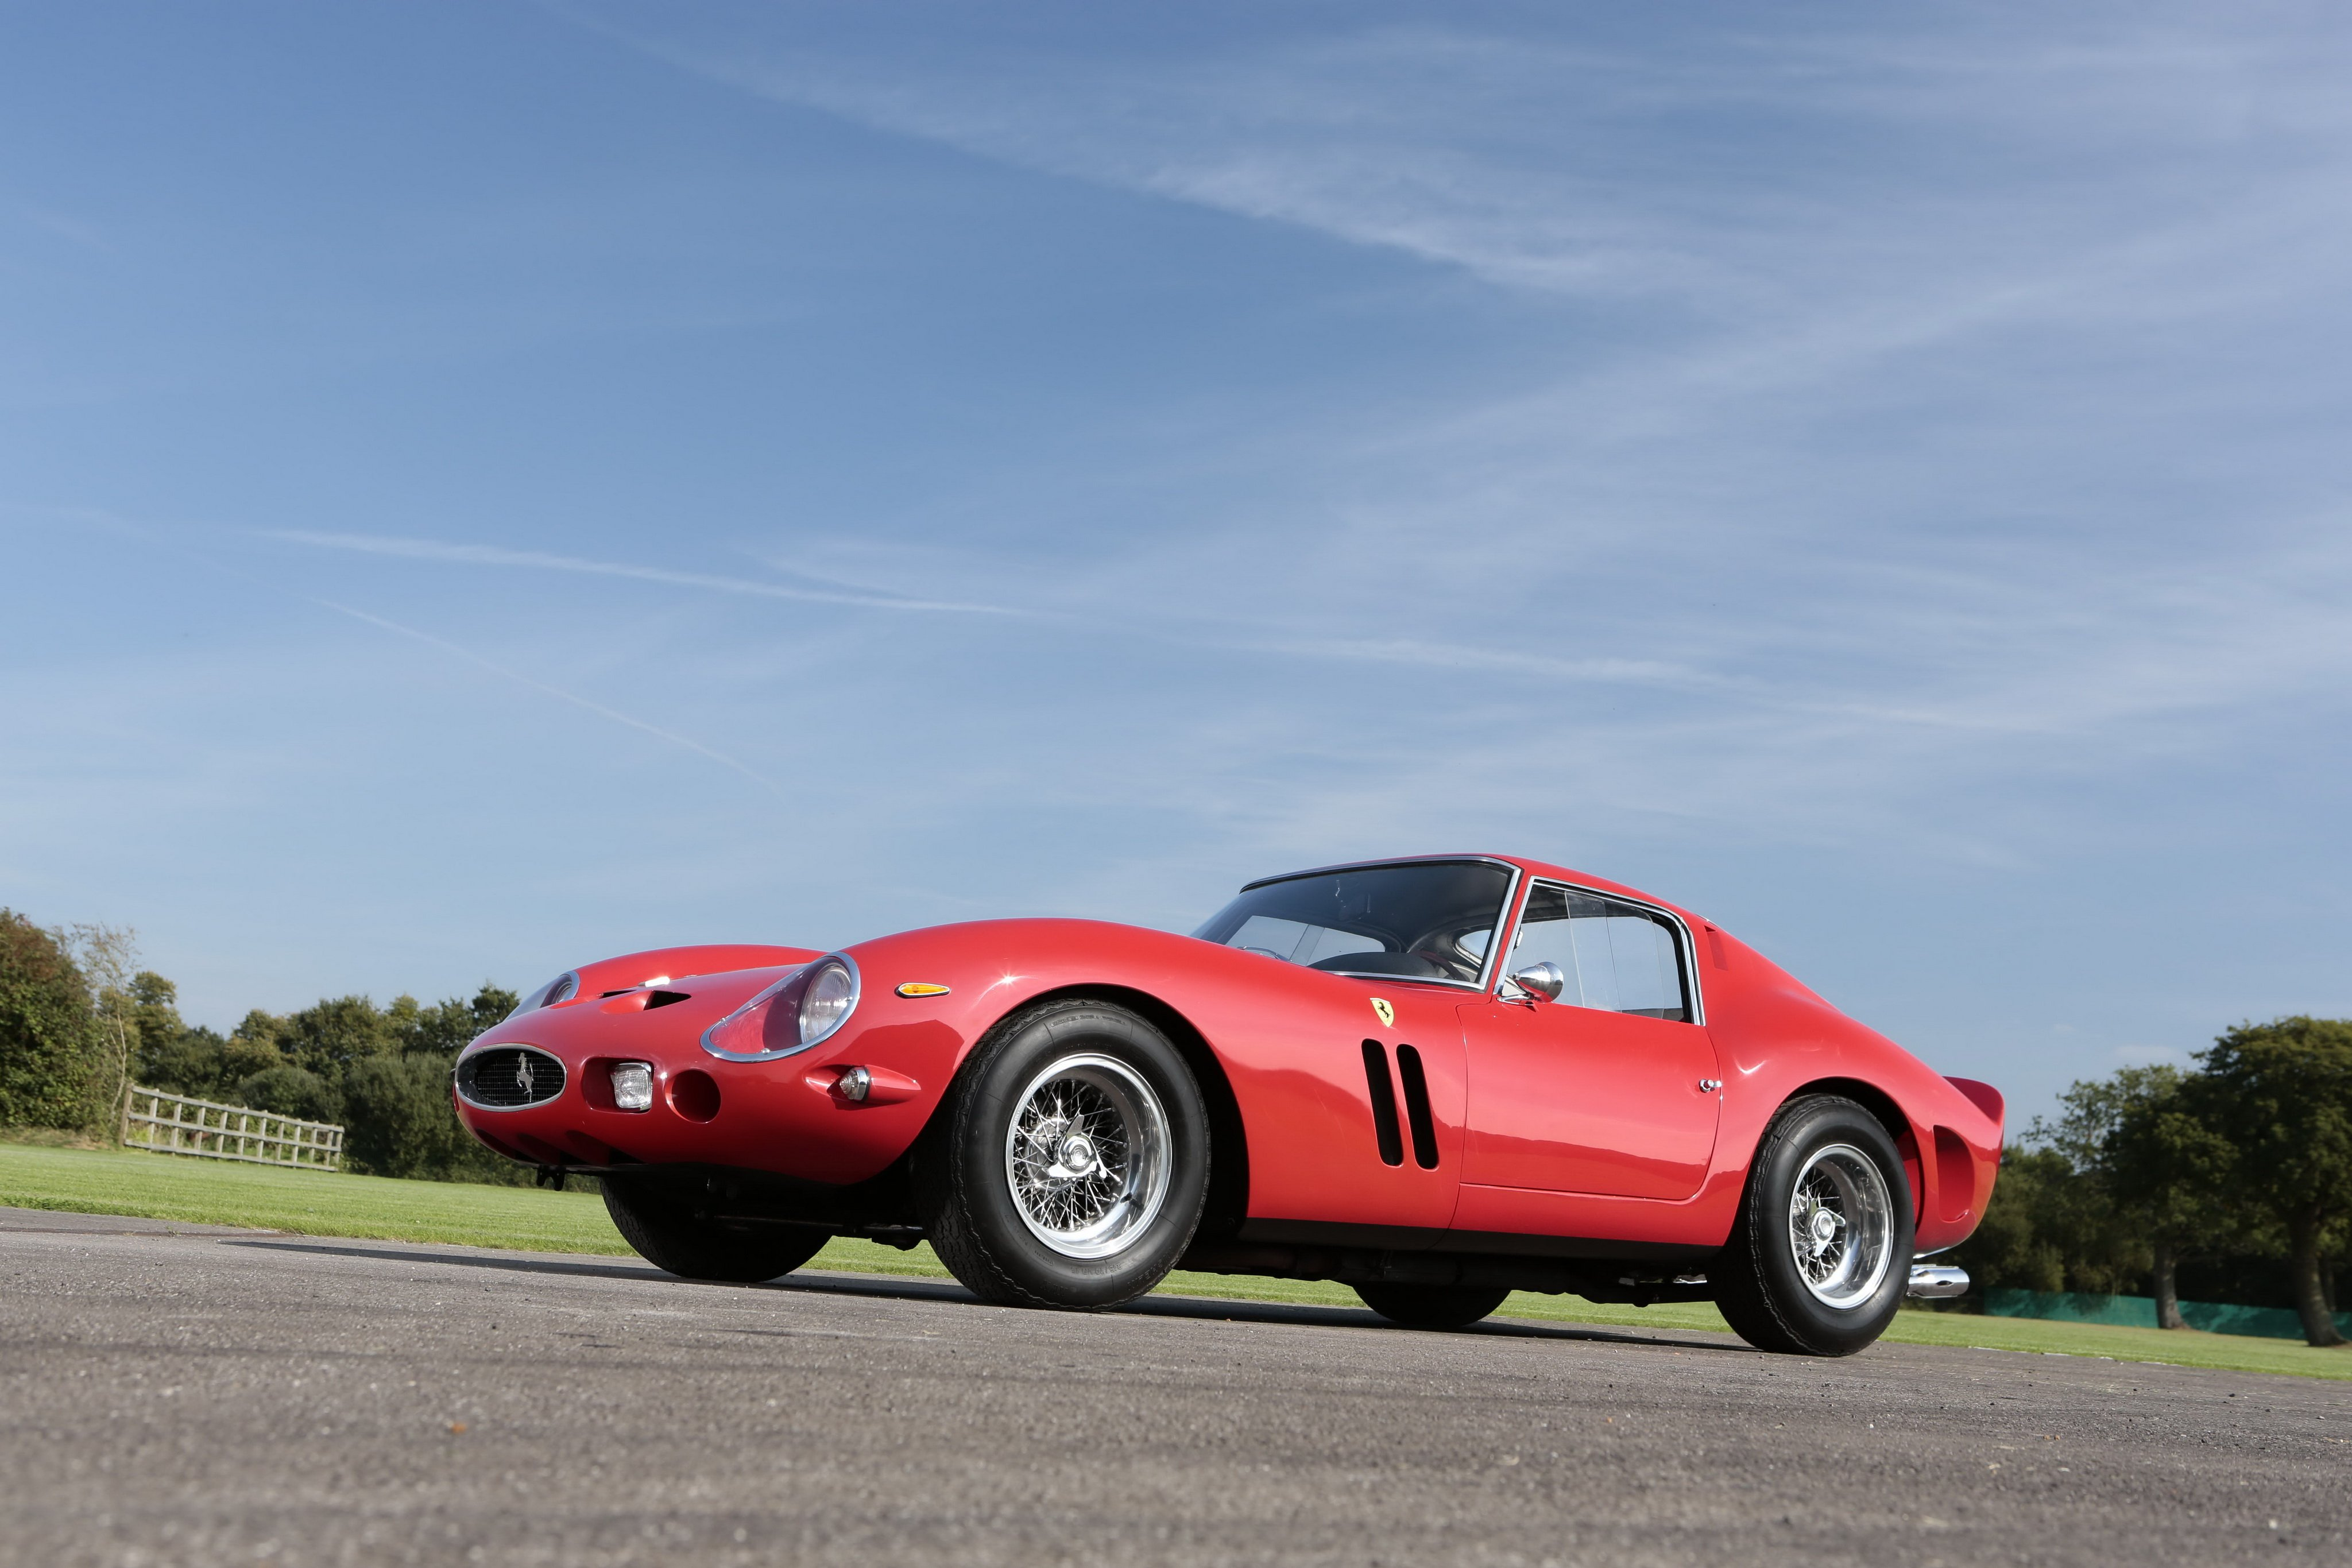 Ferrari 250 Gto Wallpapers: 1962 Ferrari 250 Gto Classic Cars Wallpaper